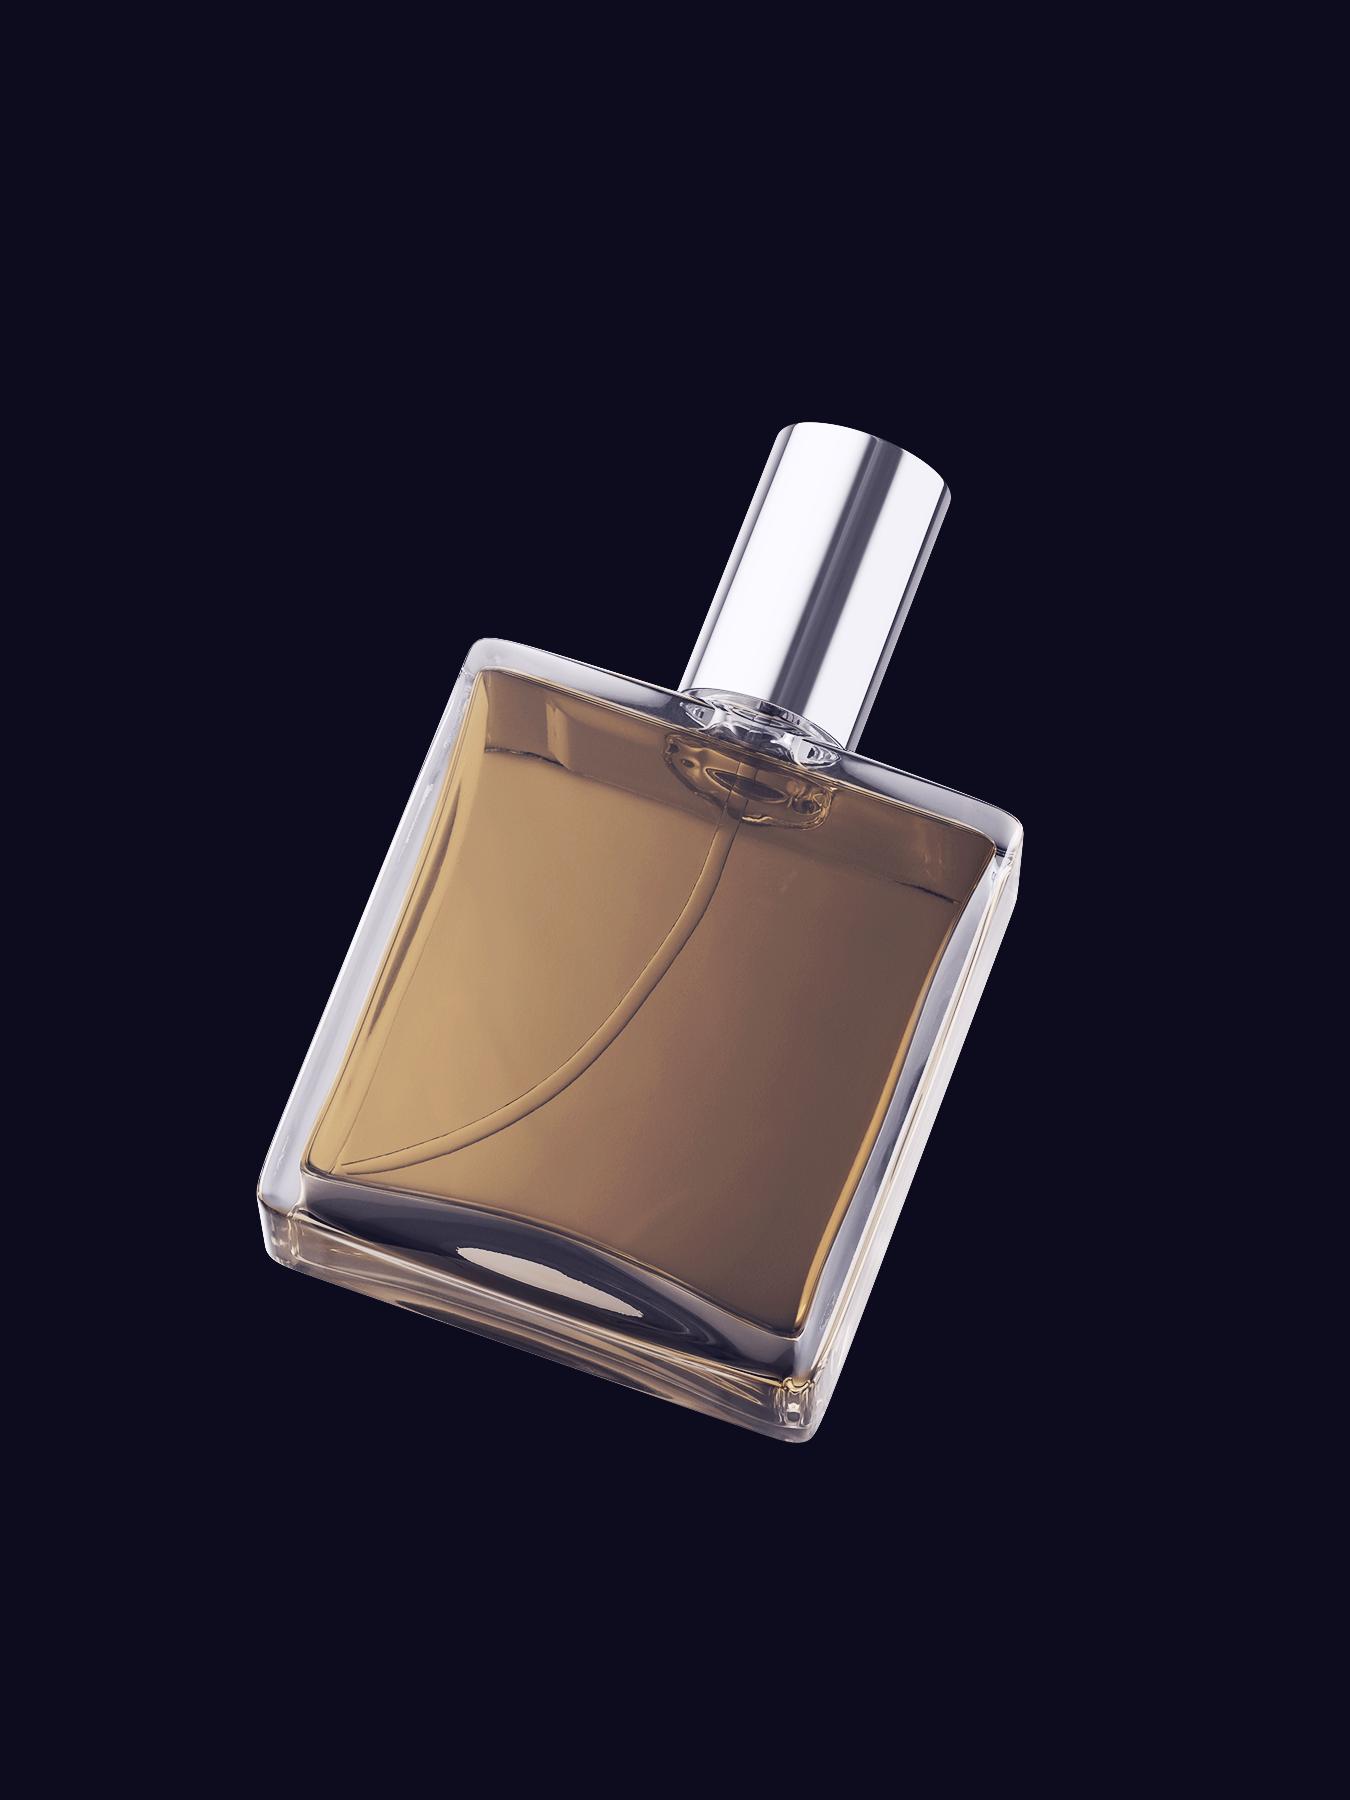 Free Perfume Flacon Bottle Mockup